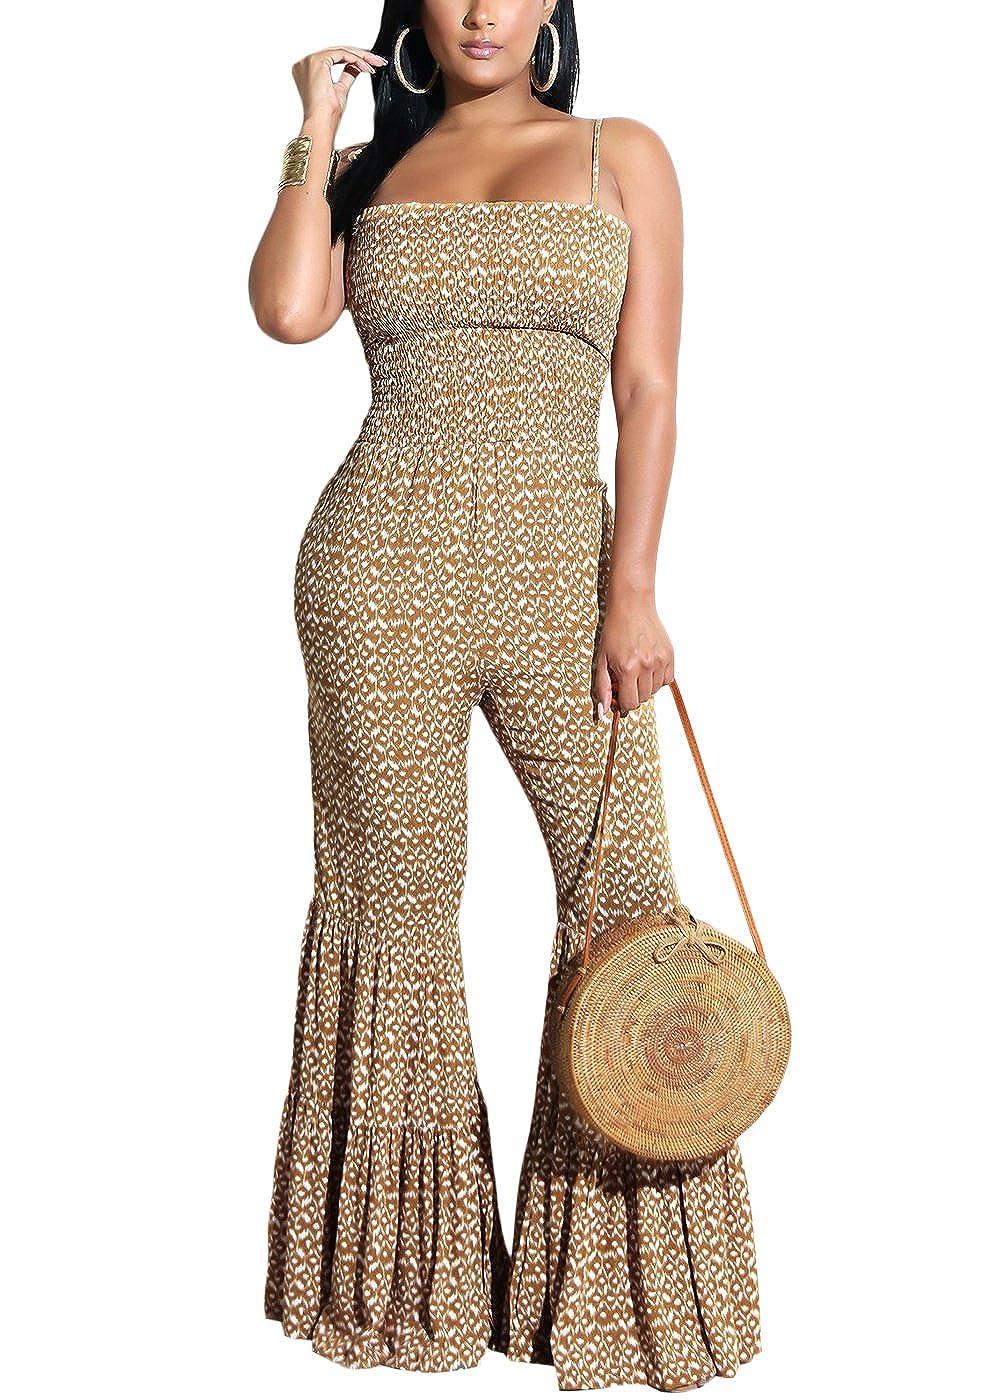 911095457ec4 Amazon.com  Yissang Women s Spaghetti Strap Print Wide Leg Long Pants Flare Jumpsuit  Romper Overalls  Clothing